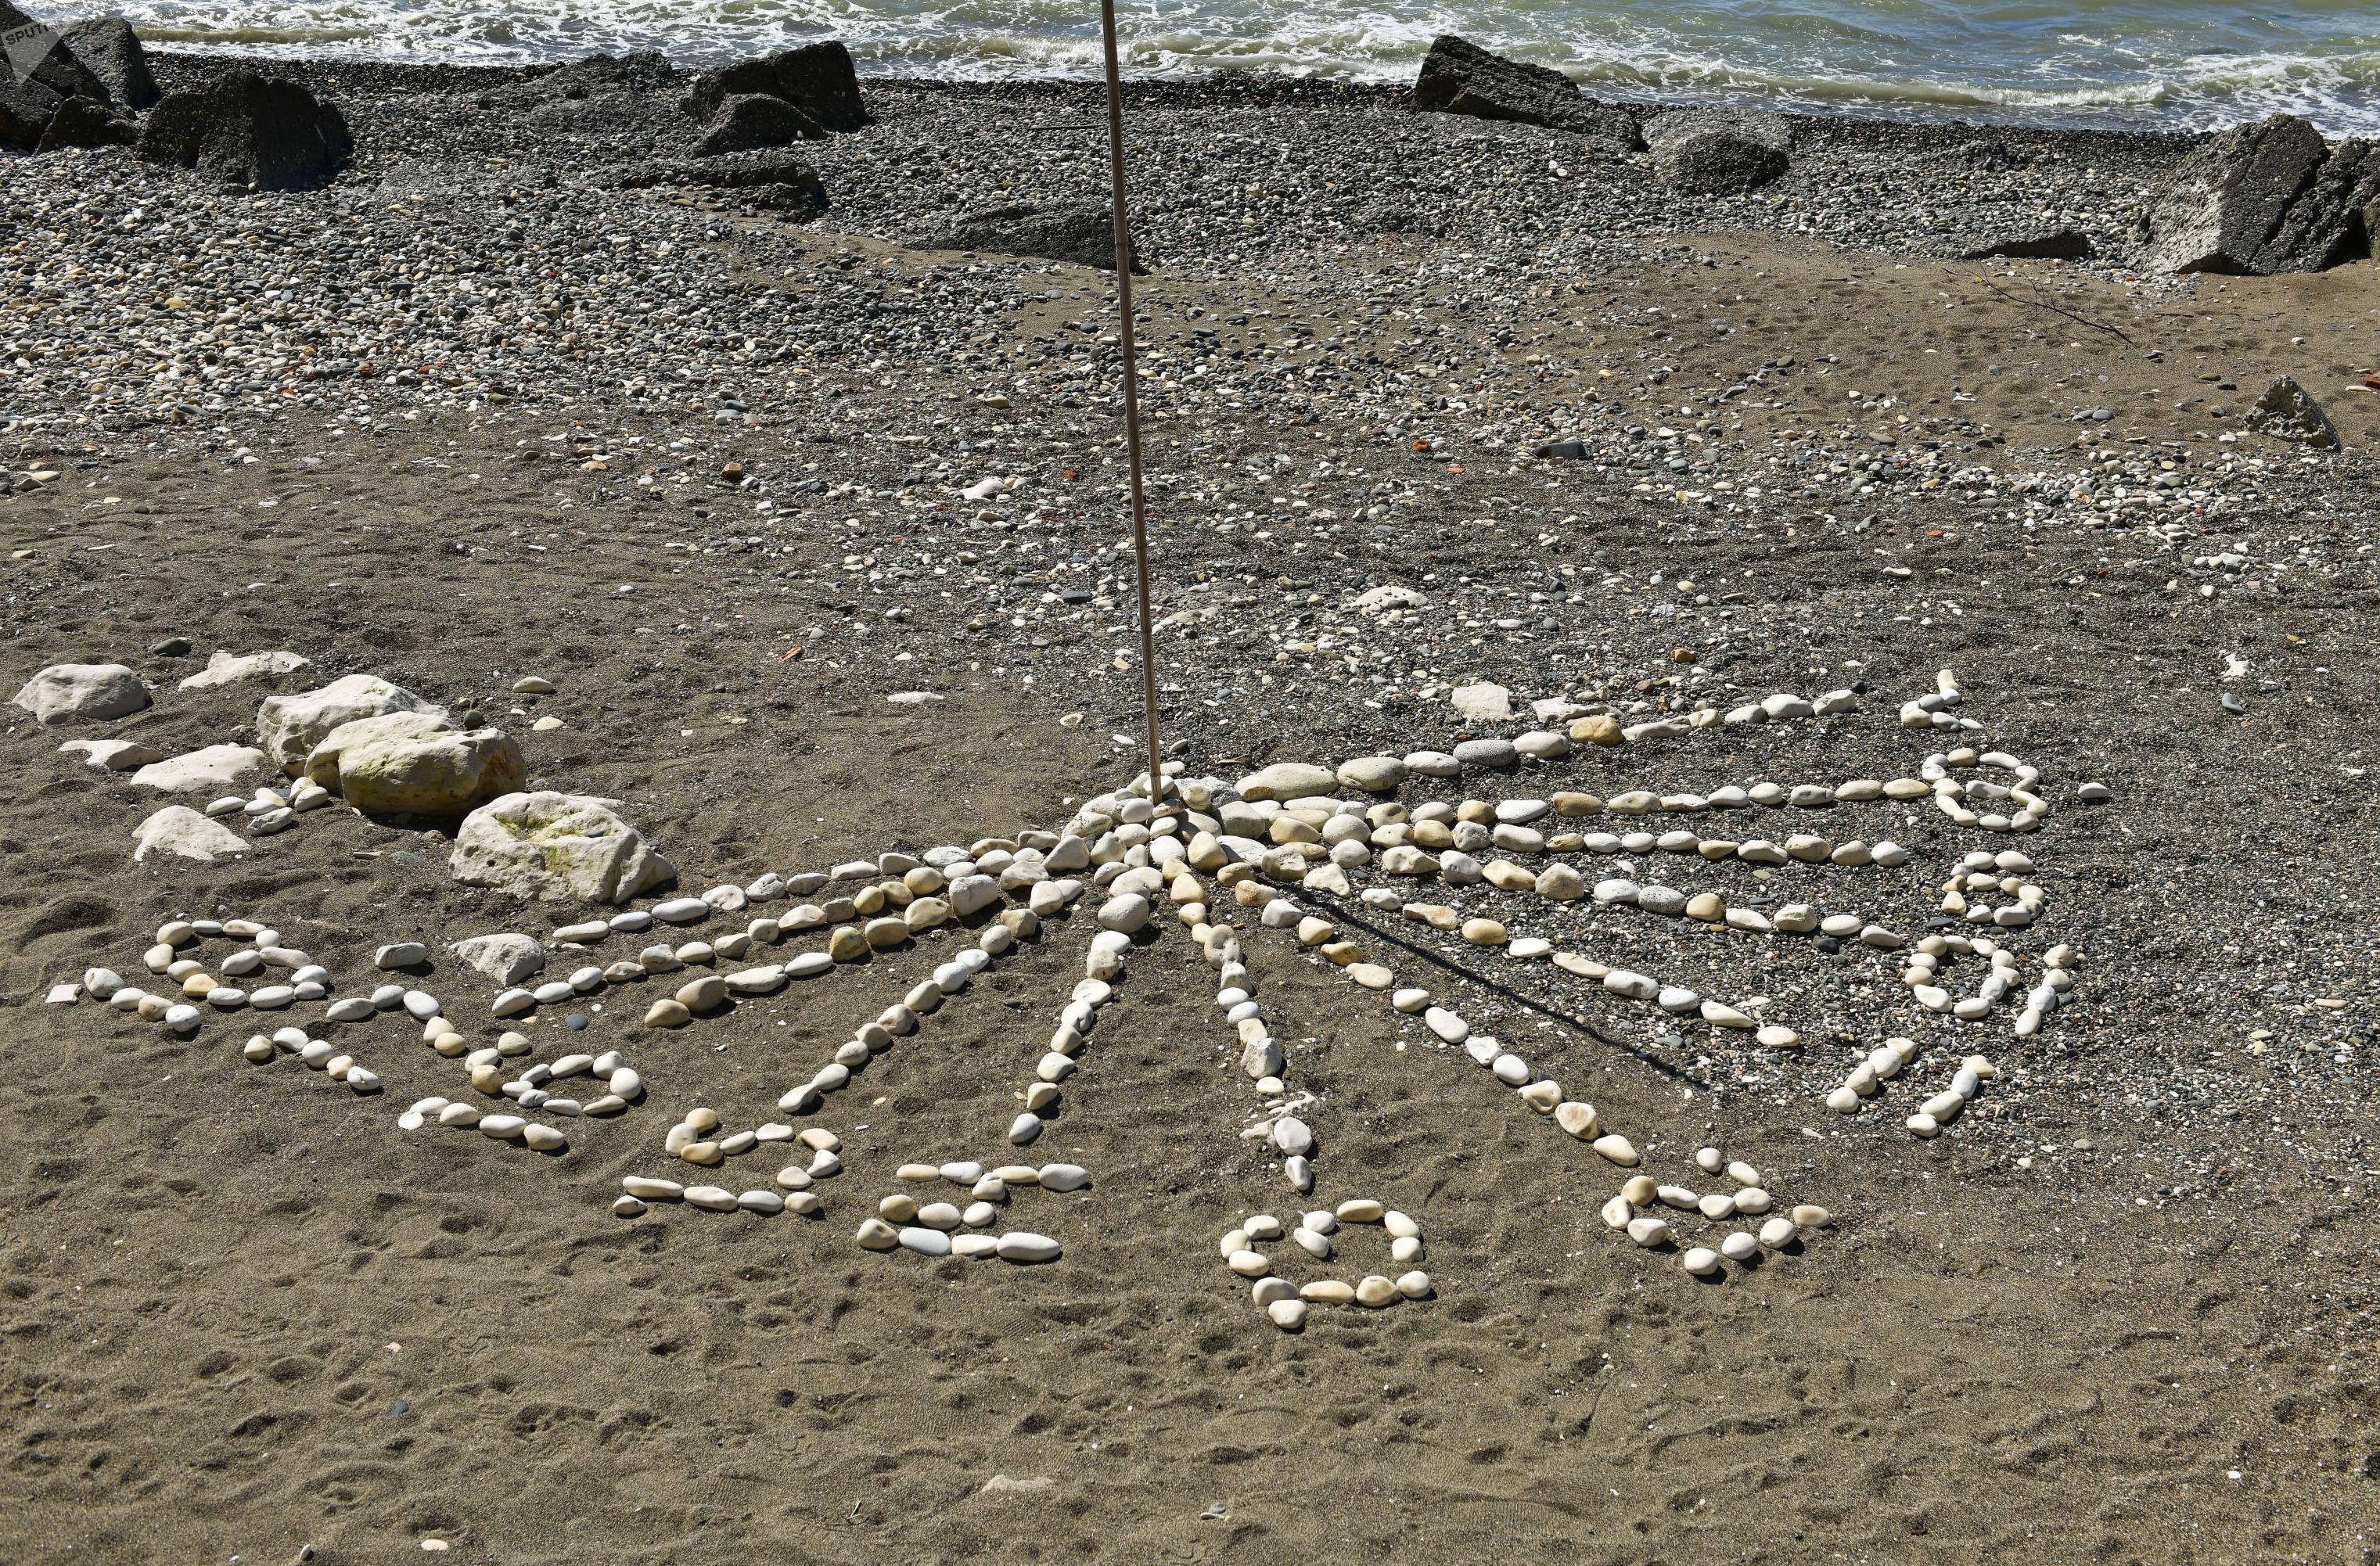 Солнечные часы на берегу